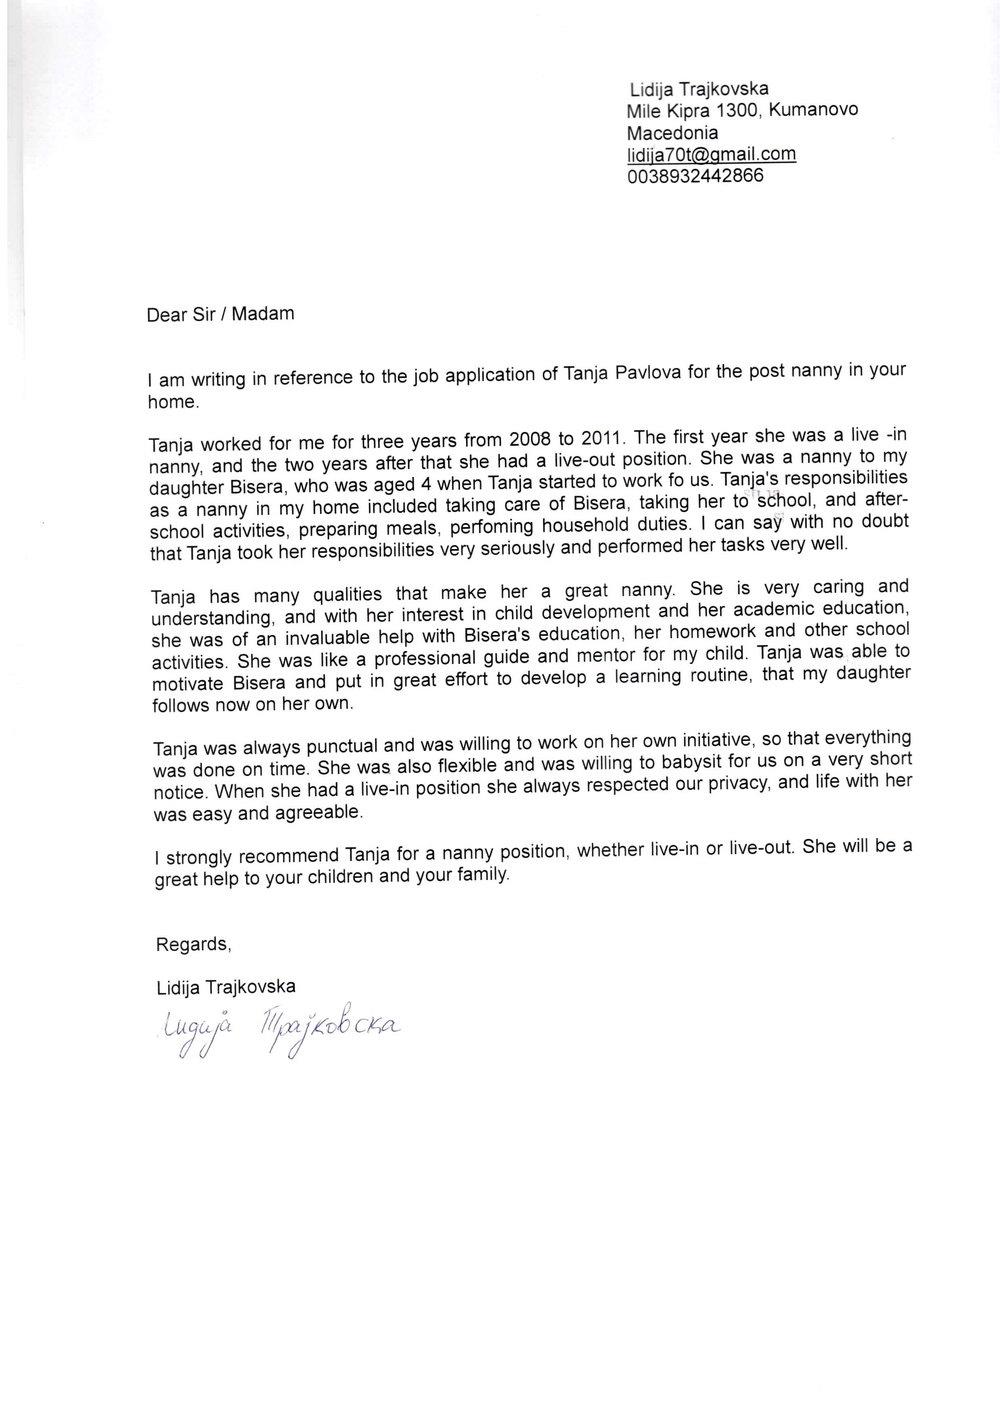 Sample Cover Letter For A Caregiver Position